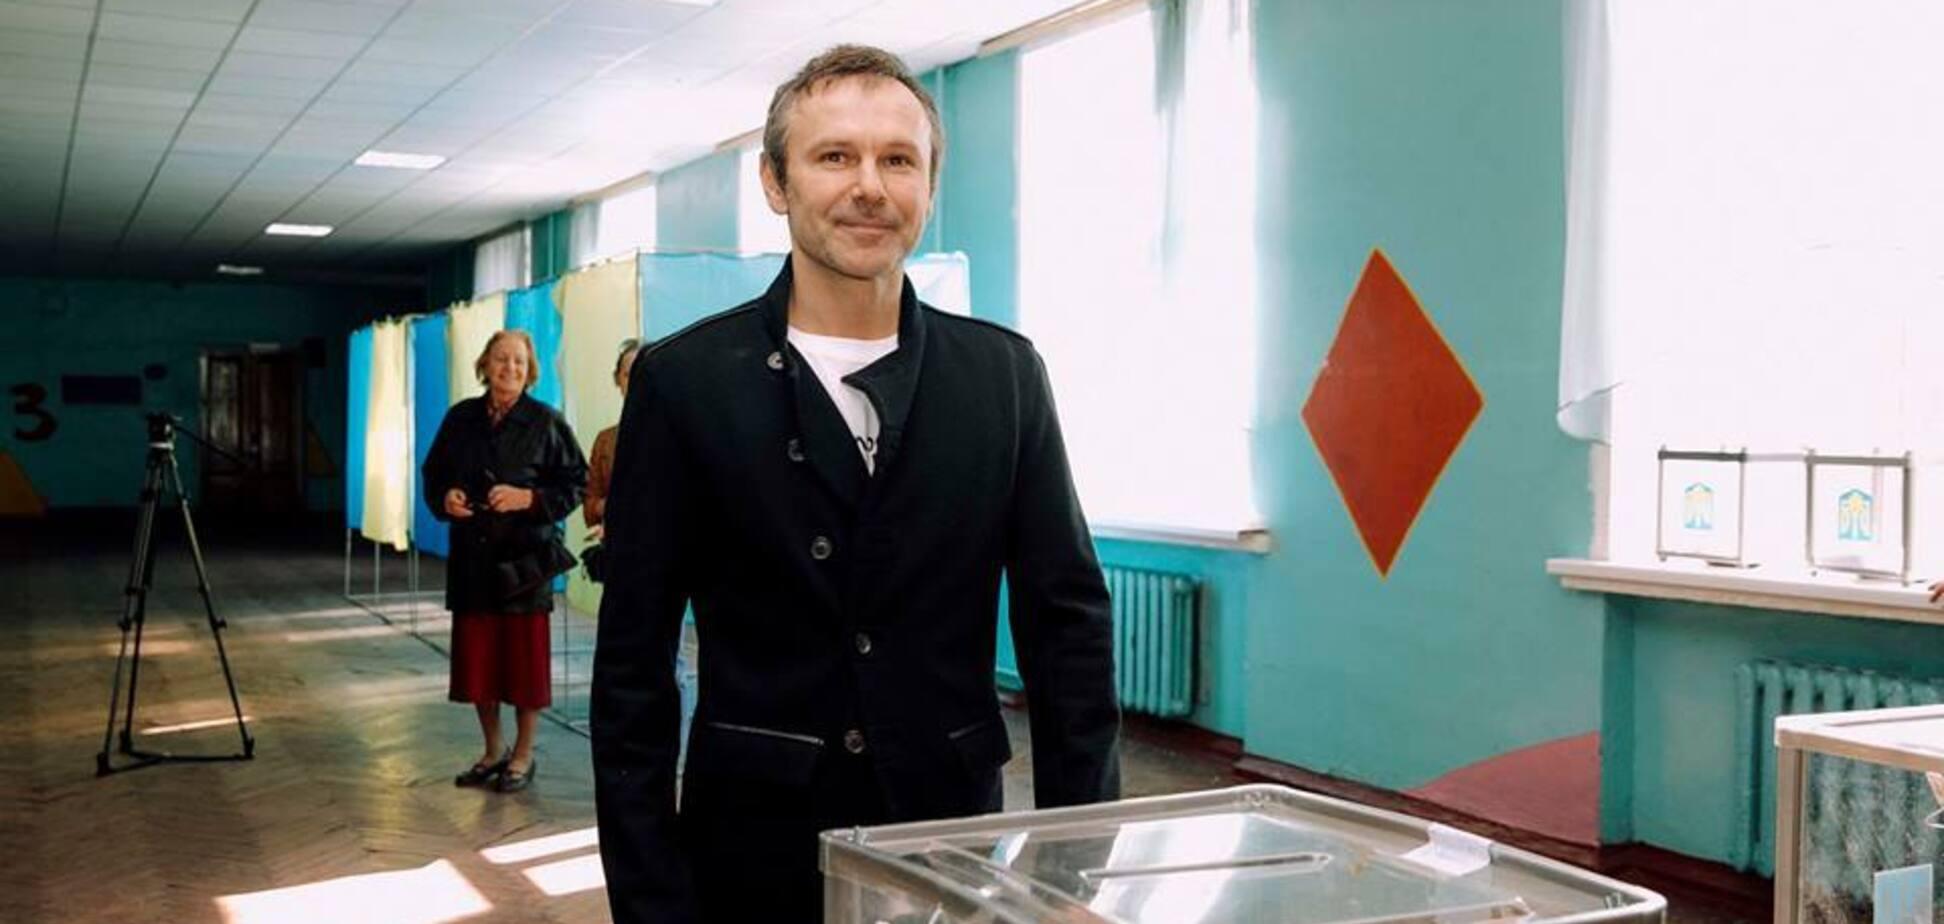 Вакарчук собрался в Раду: социолог дал прогноз